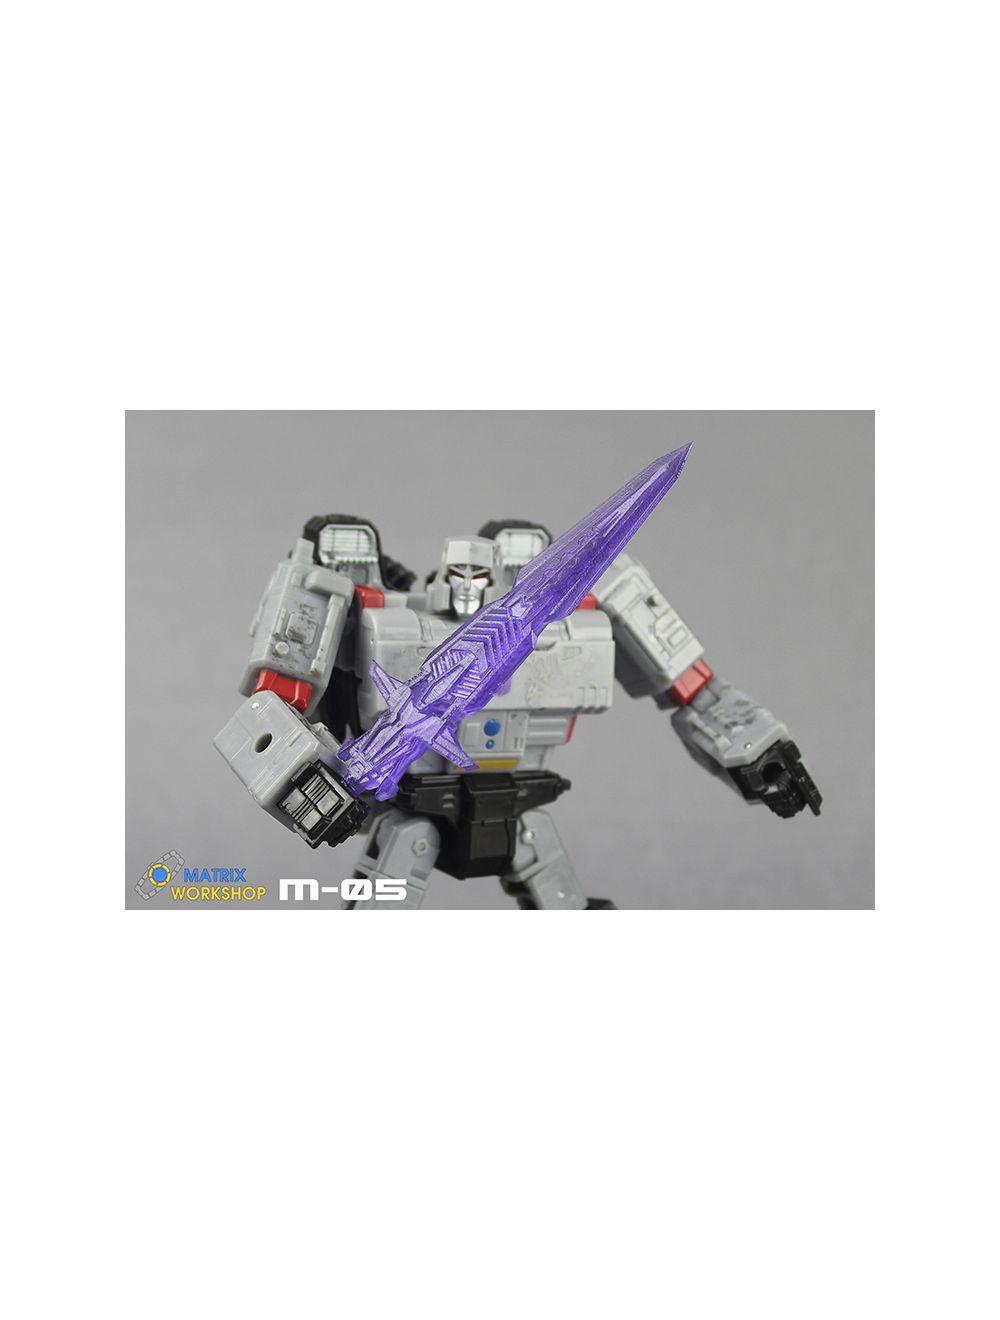 Matrix Workshop M-05 Sword Kit For Transformation Siege Voyage Megatron